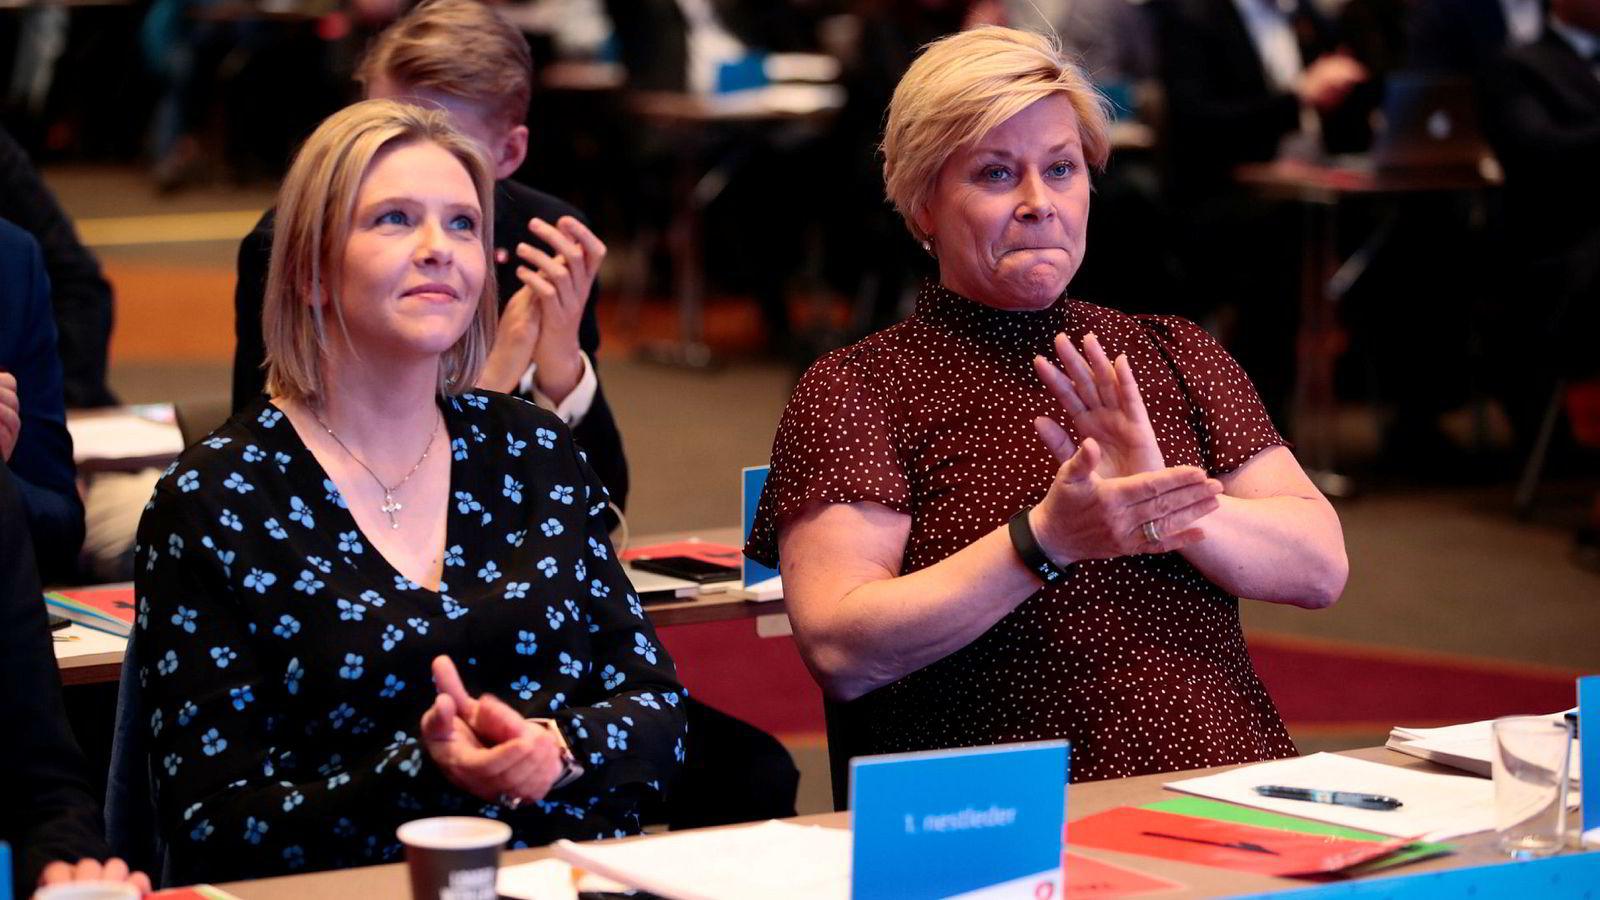 Fremskrittspartiets Sylvi Listhaug og Siv Jensen, her fotografert ved en tidligere anledning.